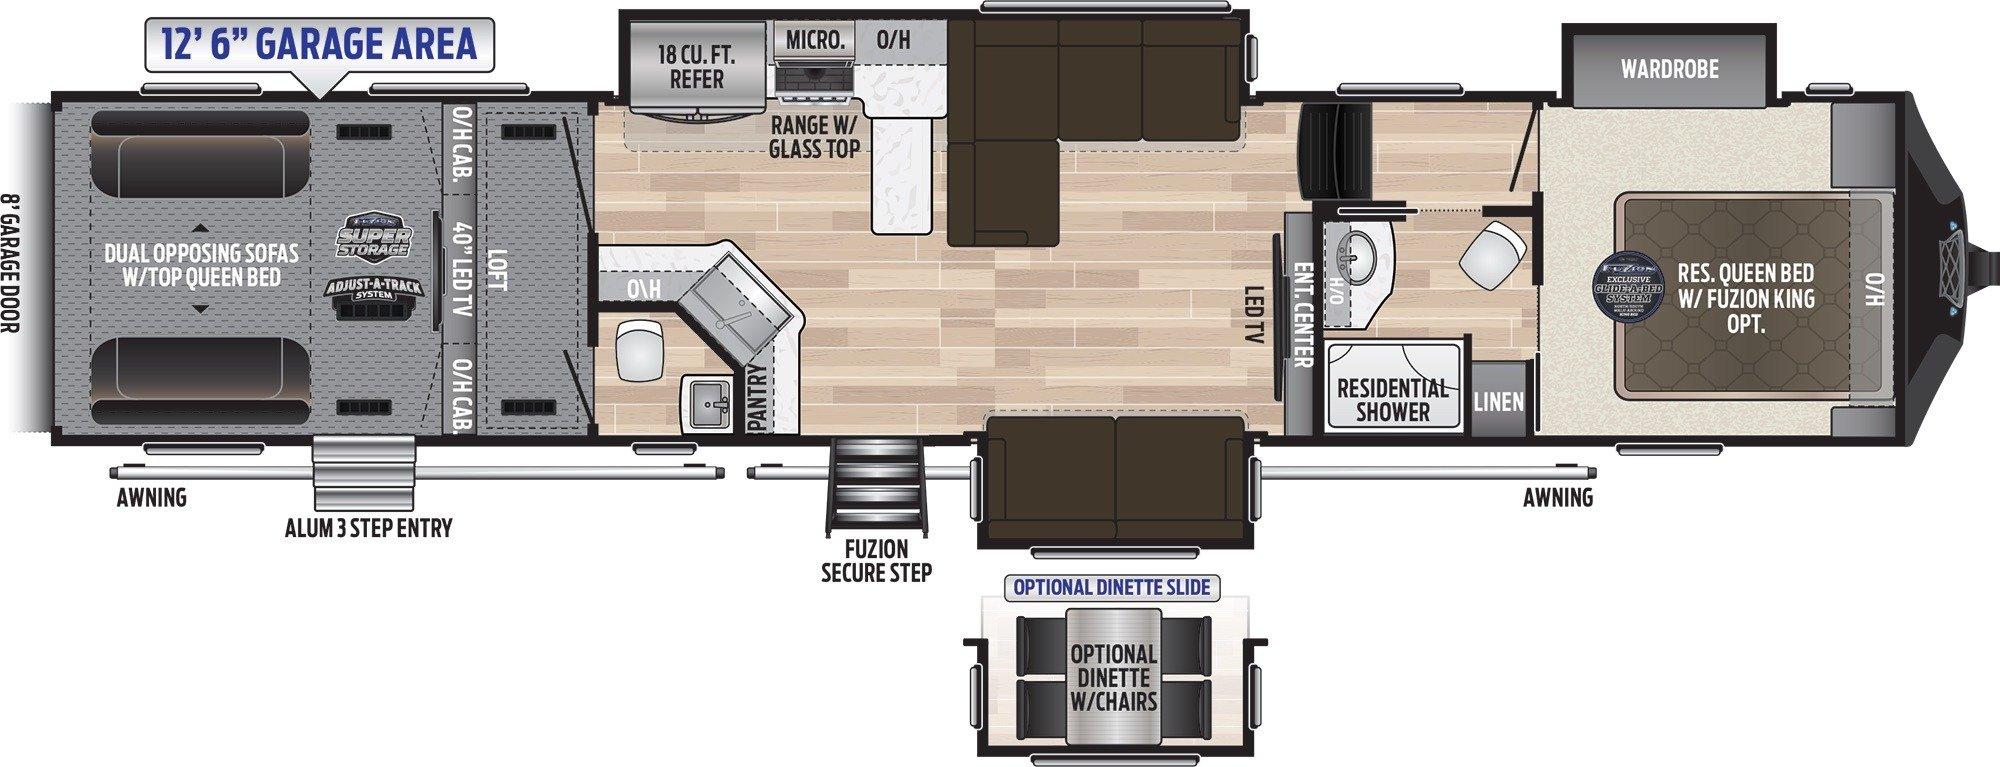 View Floor Plan for 2020 KEYSTONE FUZION 429